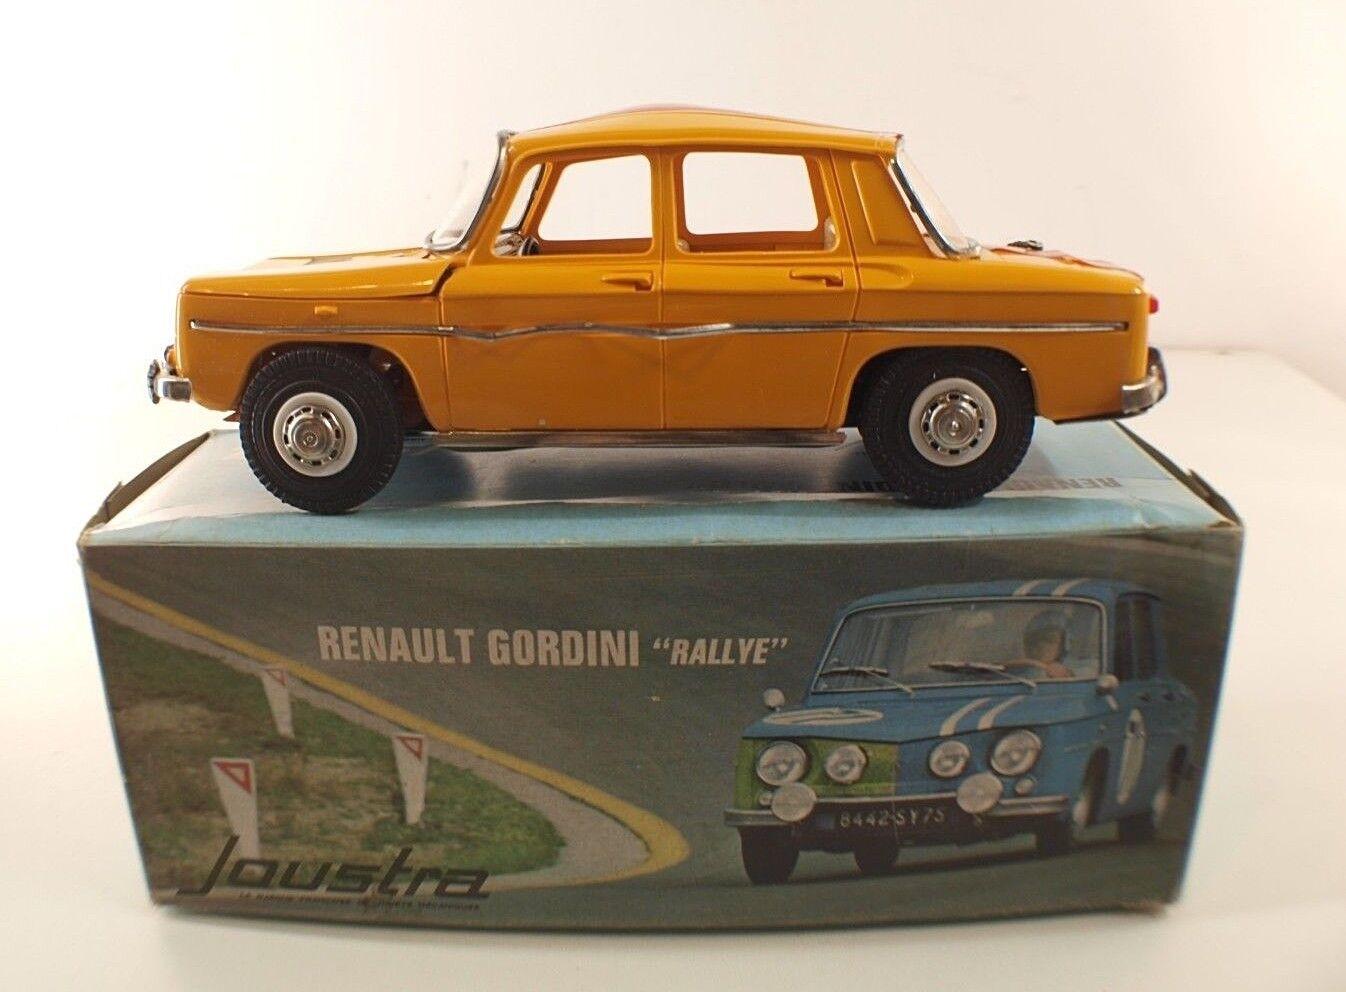 Joustra Nr. 2167 Renault 8 Gordini Rallye Aufbau Carlo Links Friction Schachtel